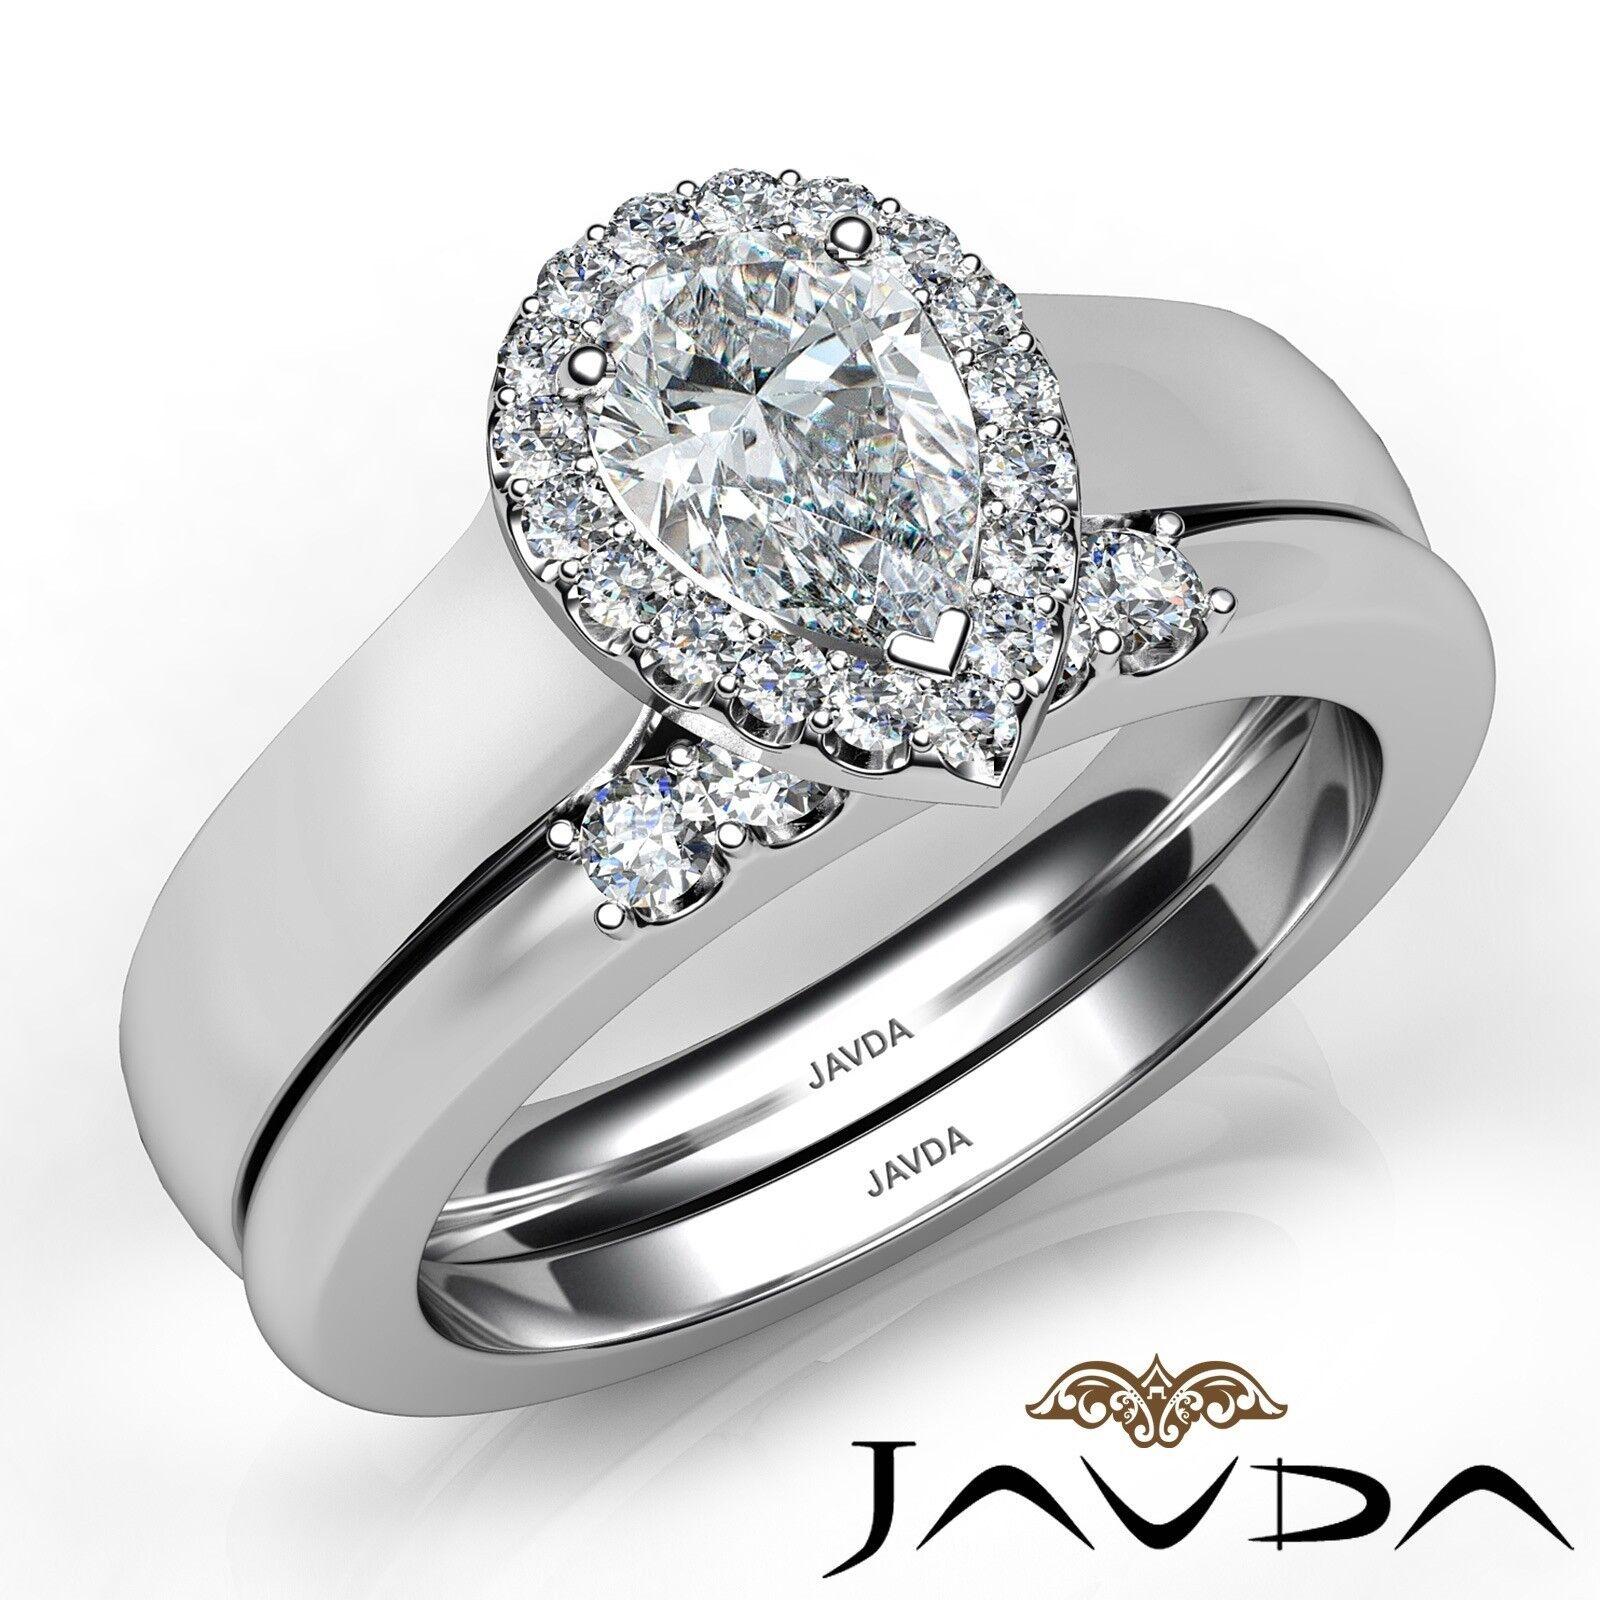 1.33ctw U Cut Pave Set Halo Bridal Pear Diamond Engagement Ring GIA F-VS2 W Gold 1